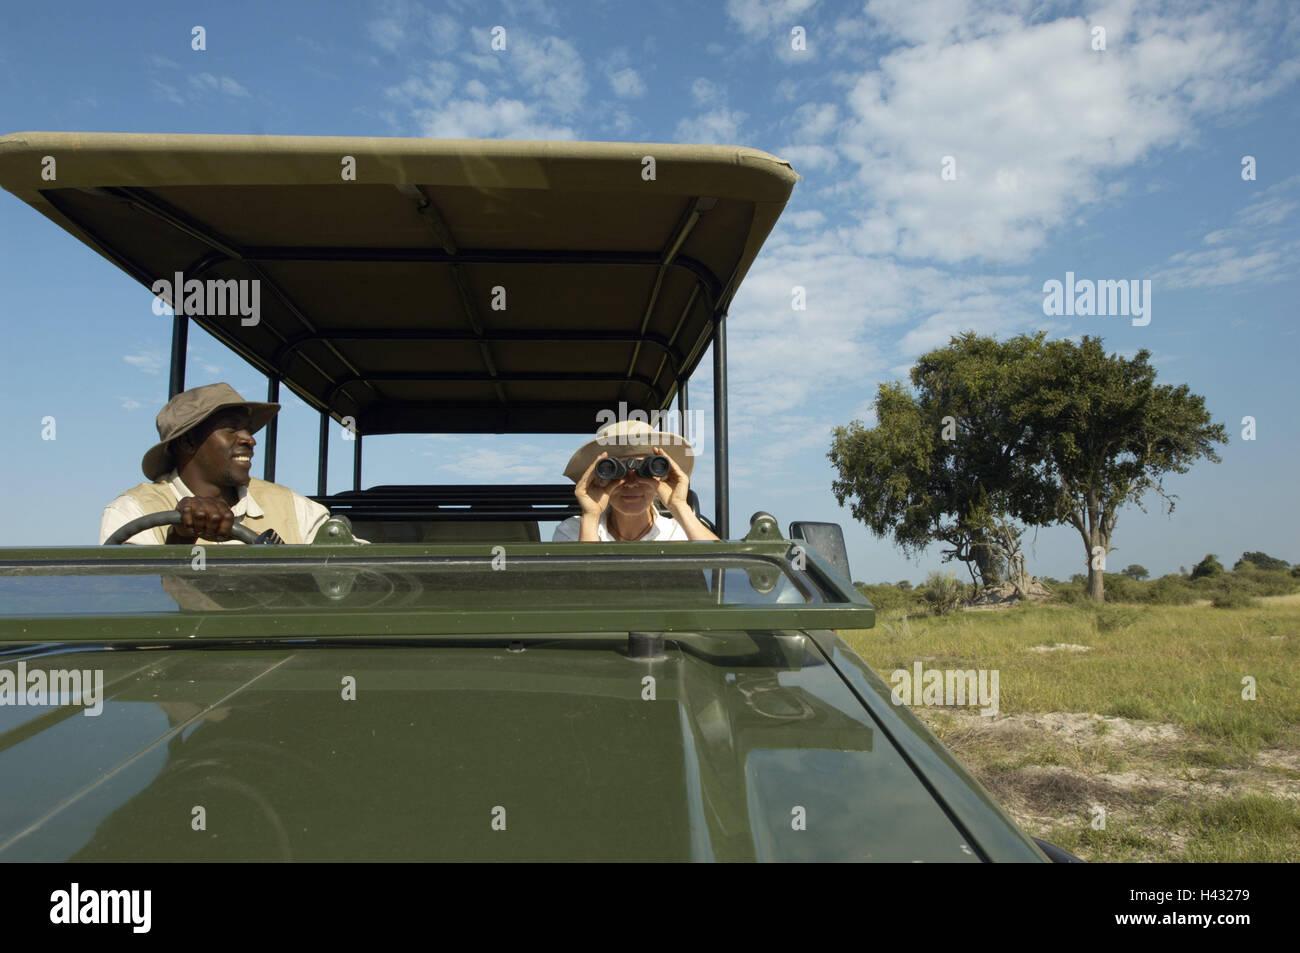 Botswana, Okavango delta, safari tour, jeep, tourist, binoculars, Africa, nature, person, man, non-white, local, - Stock Image